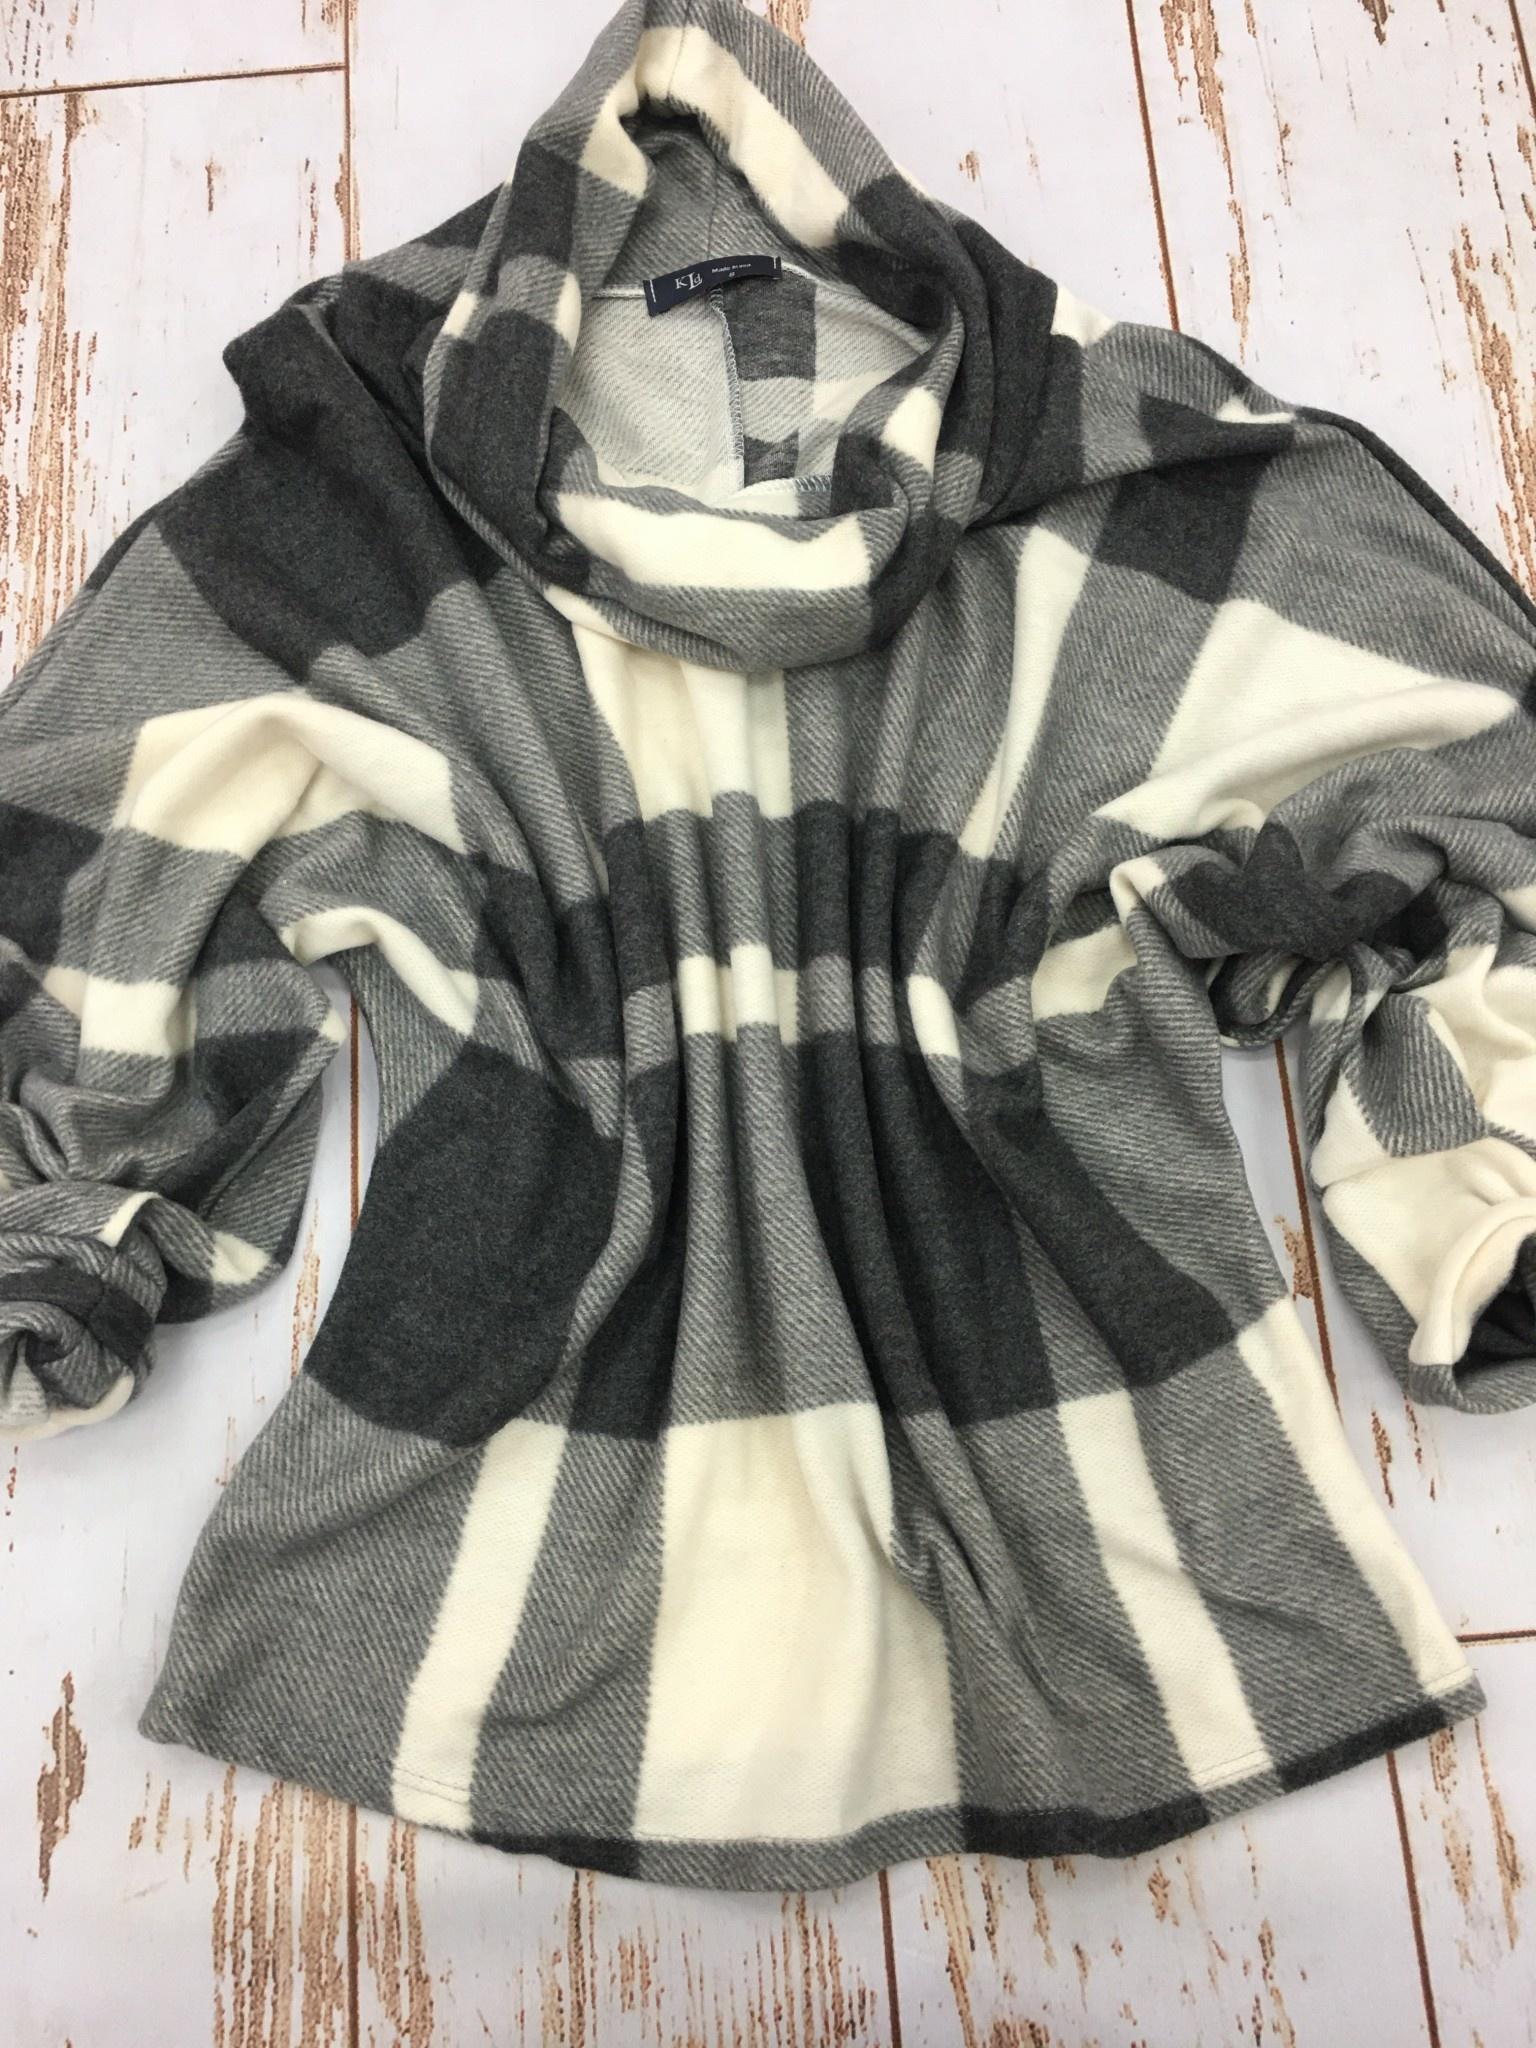 KLD Cowl Neck Plaid Sweater